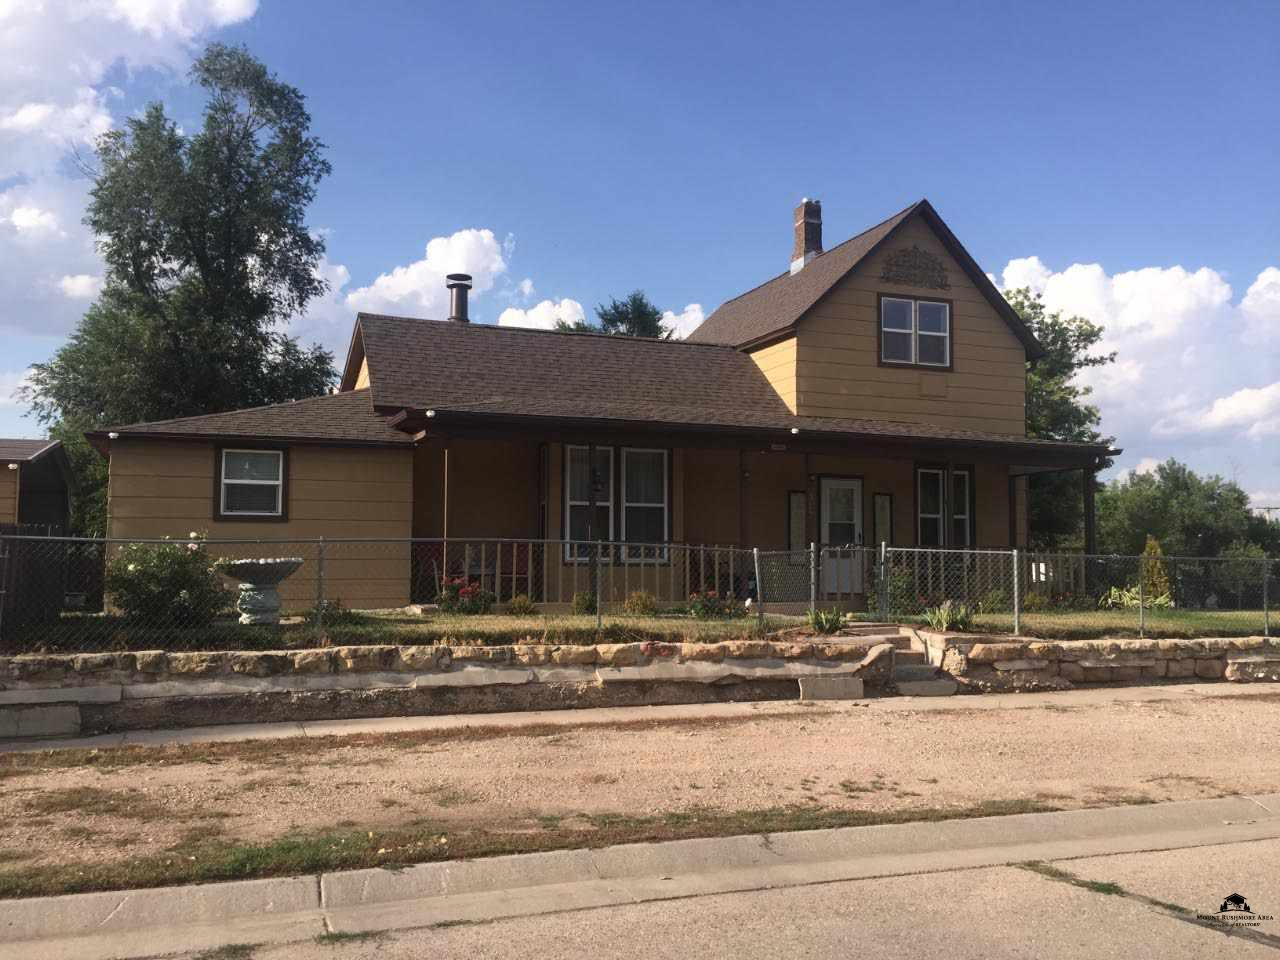 317 Faulk Street - $132,500